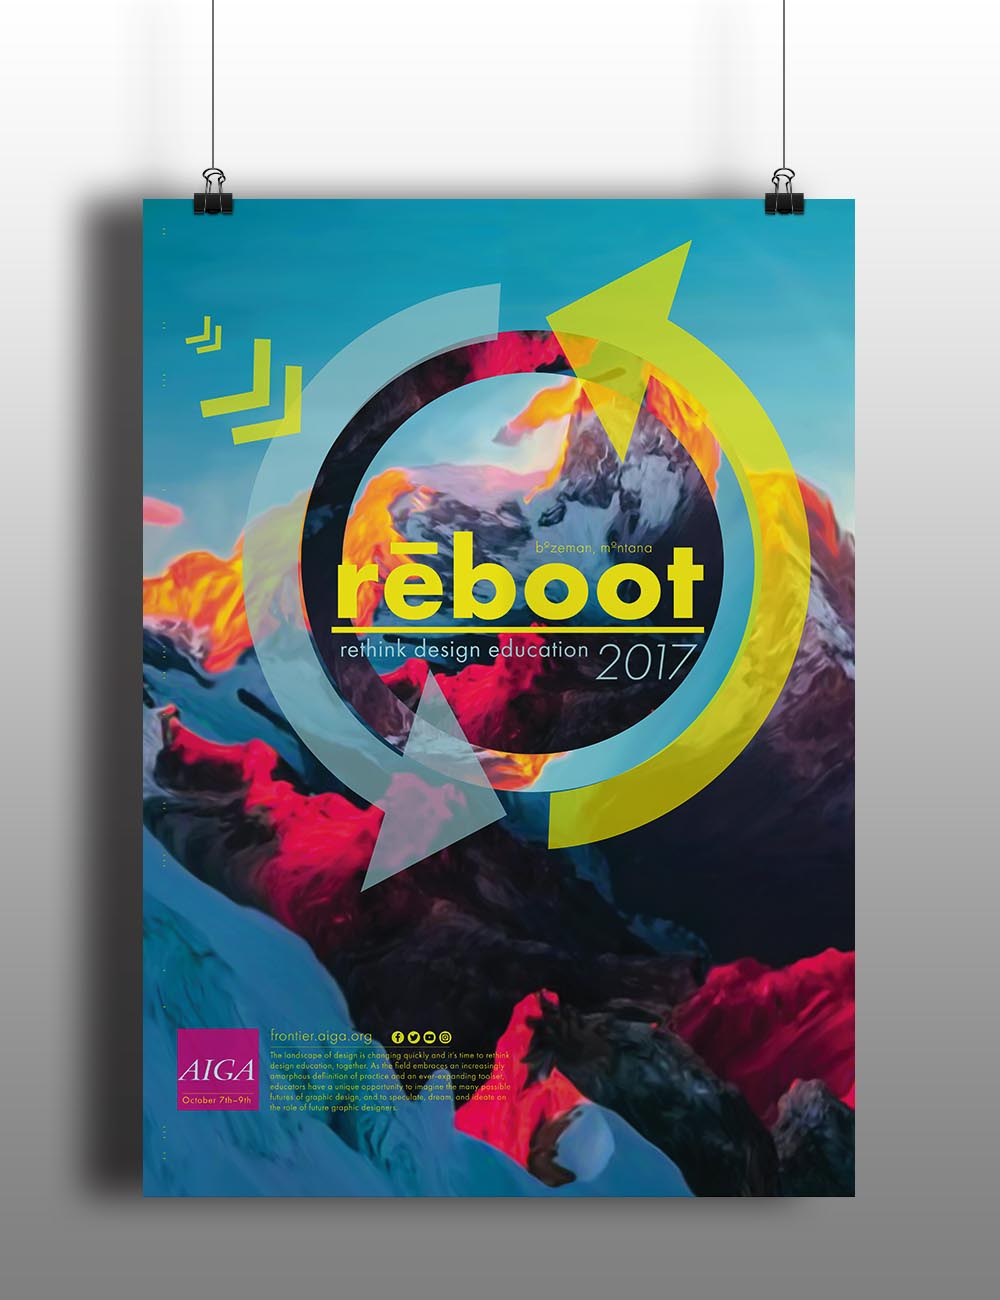 reboot_Poster_Mockup.jpg